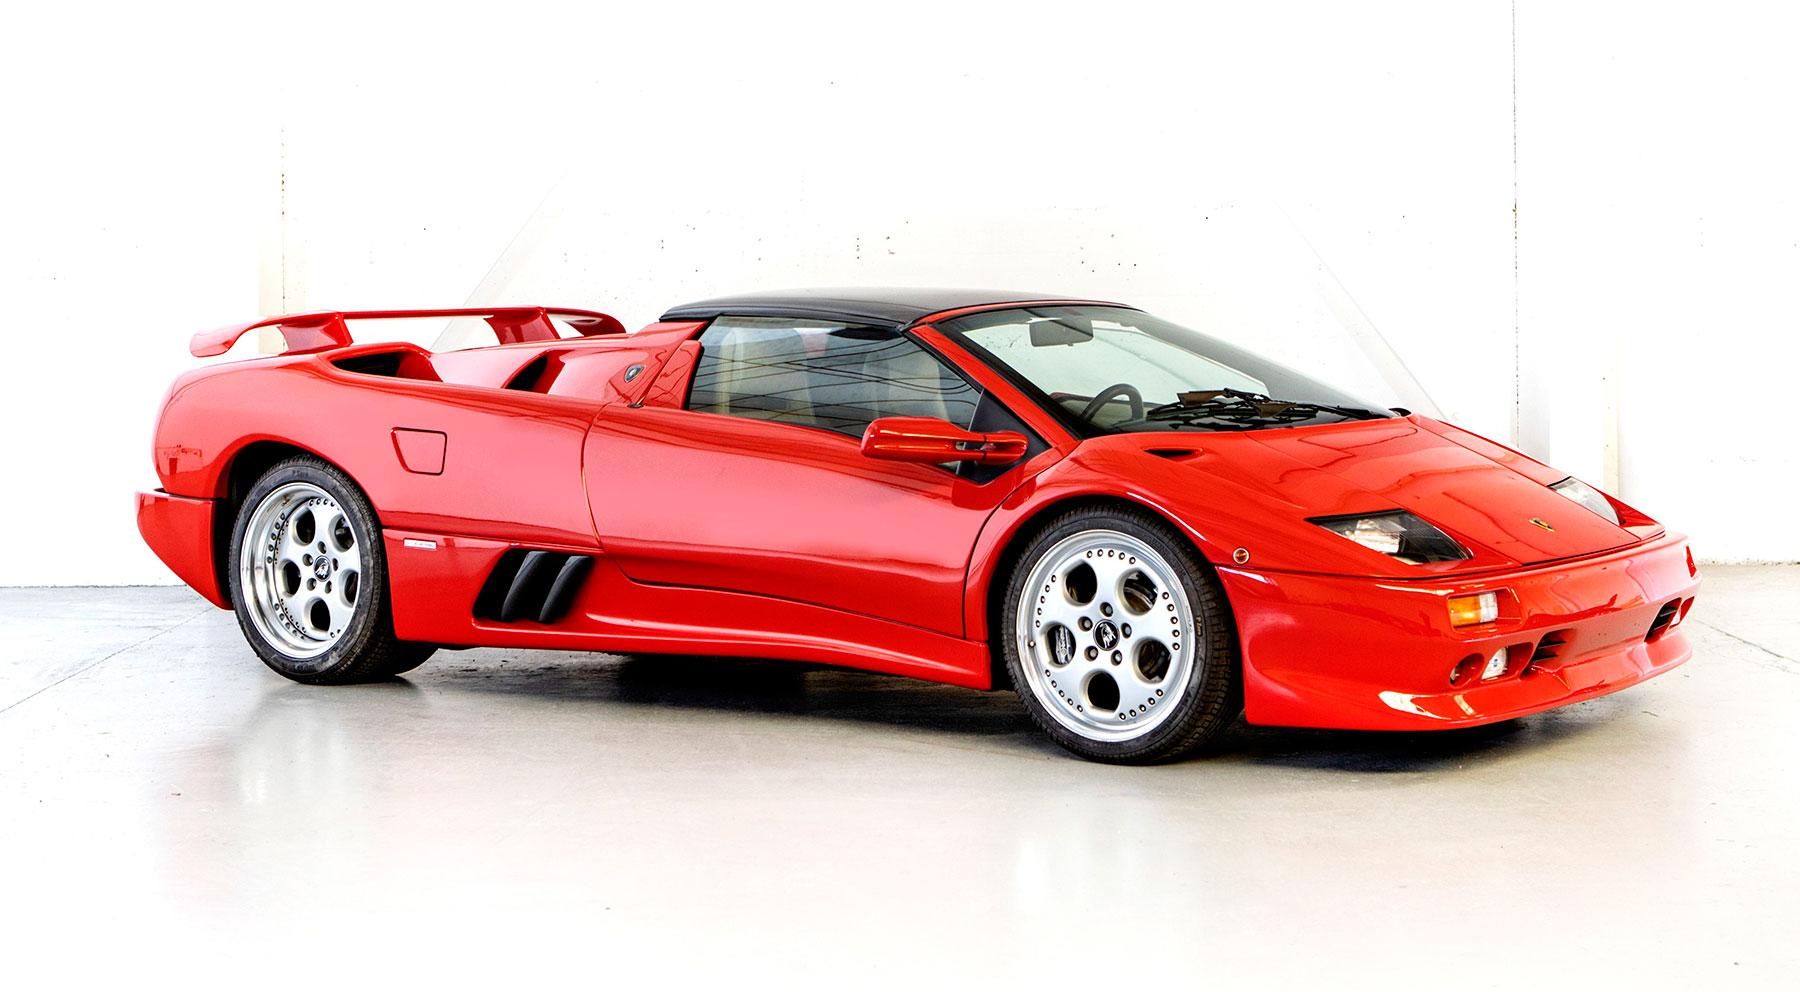 Lamborghini Diablo VT Roadster // 200.348 euros